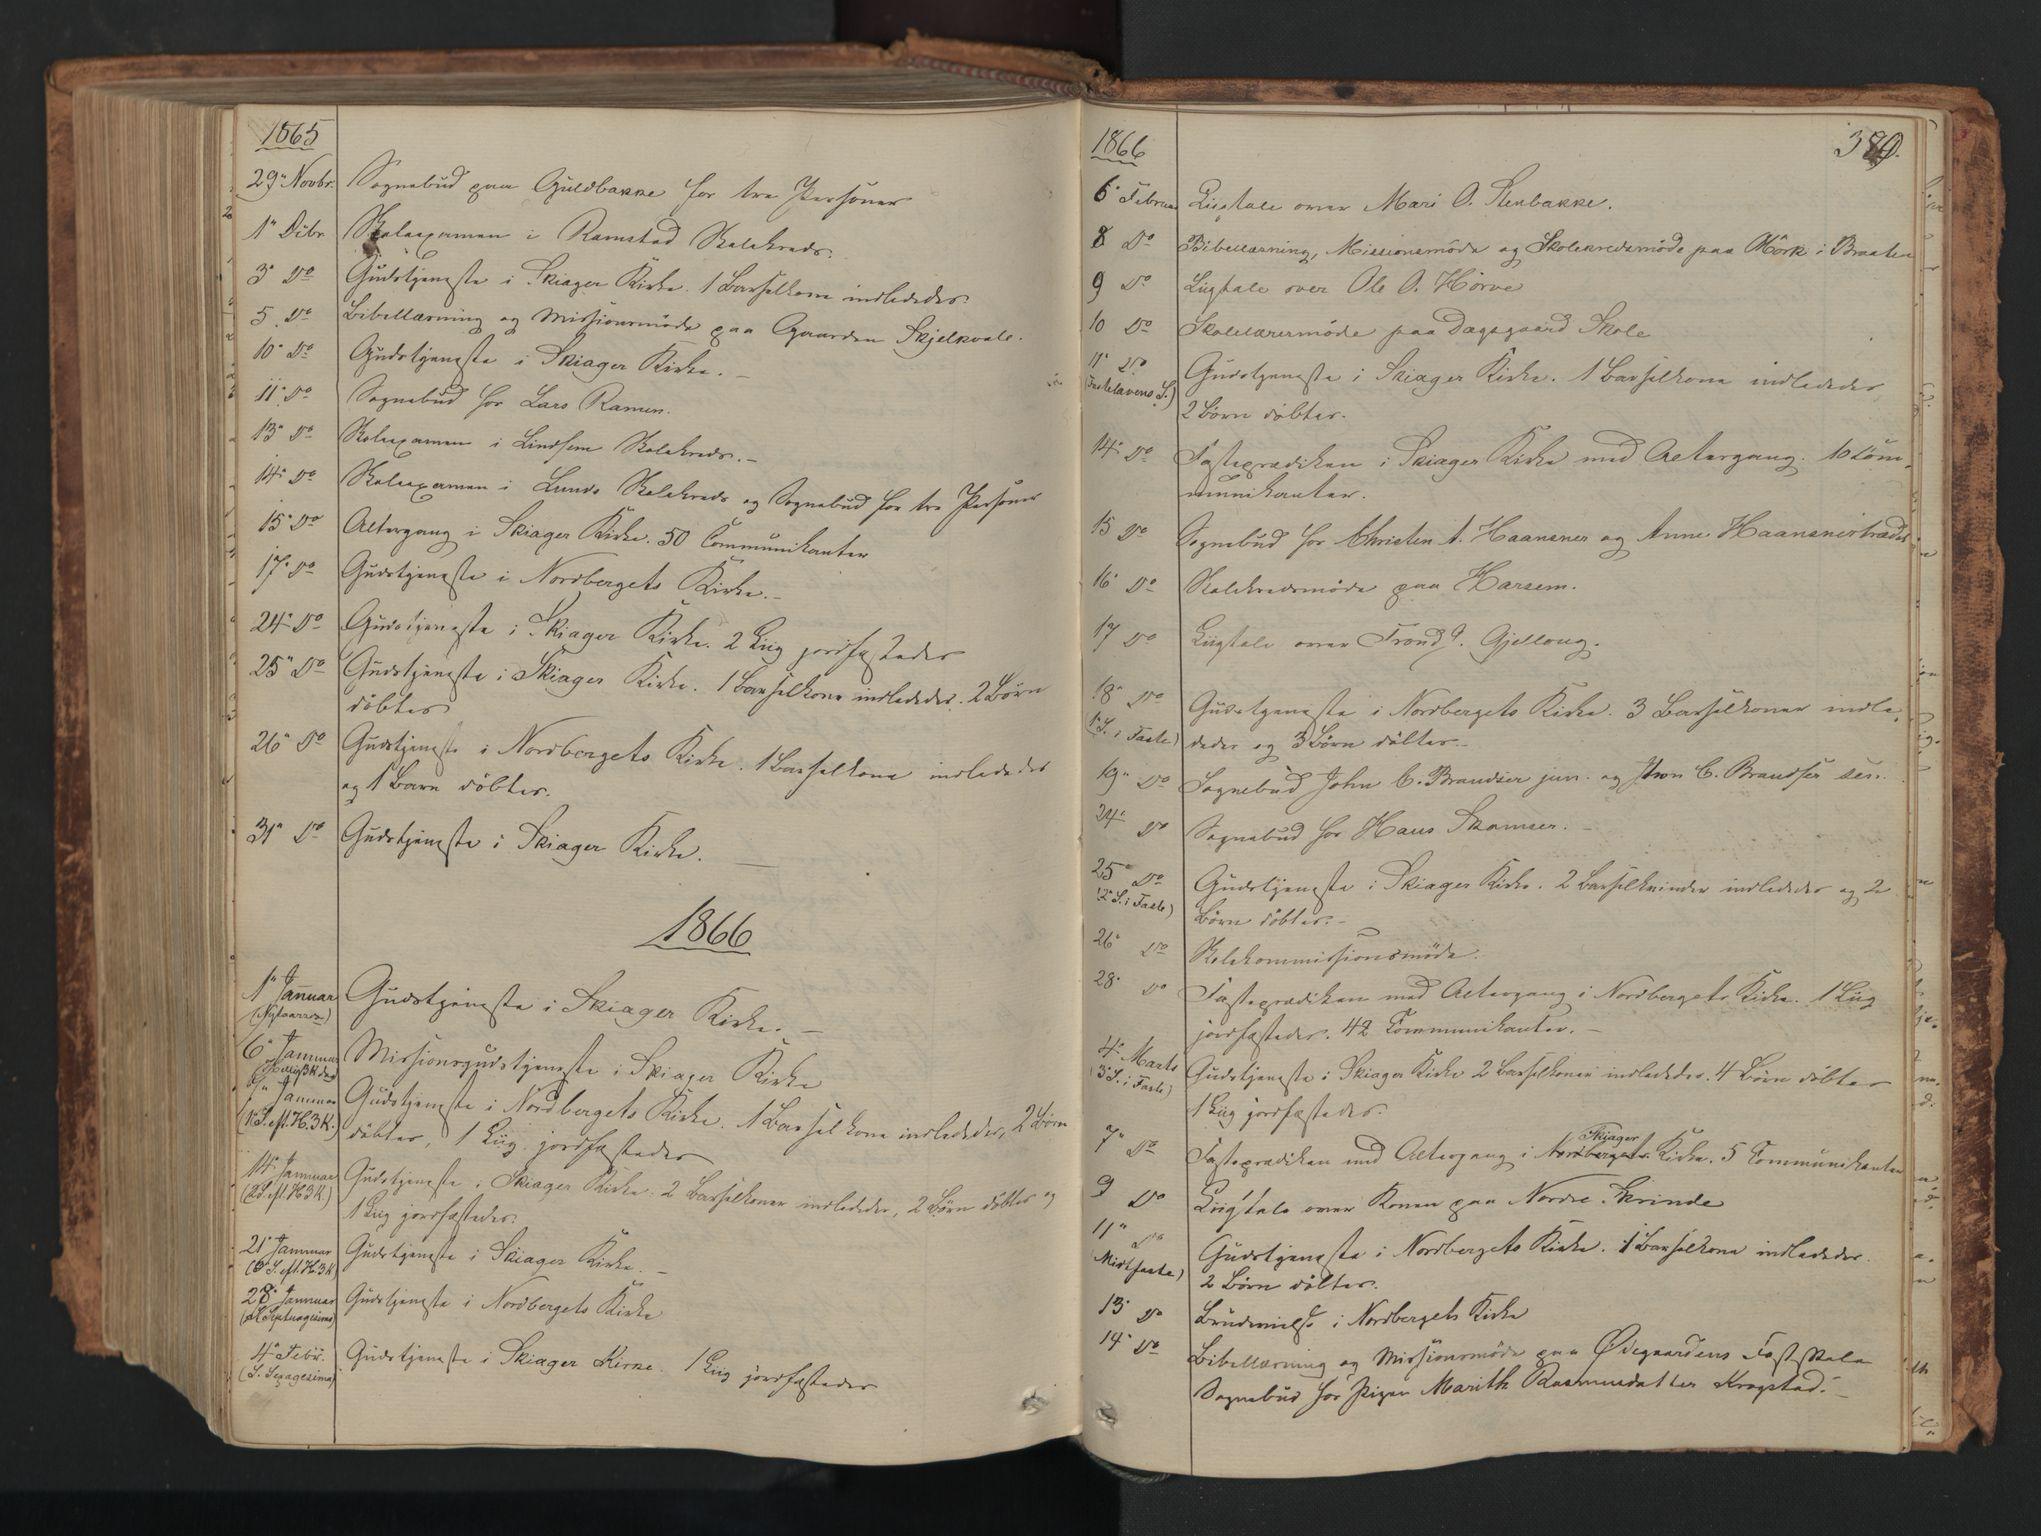 SAH, Skjåk prestekontor, Ministerialbok nr. 1, 1863-1879, s. 380